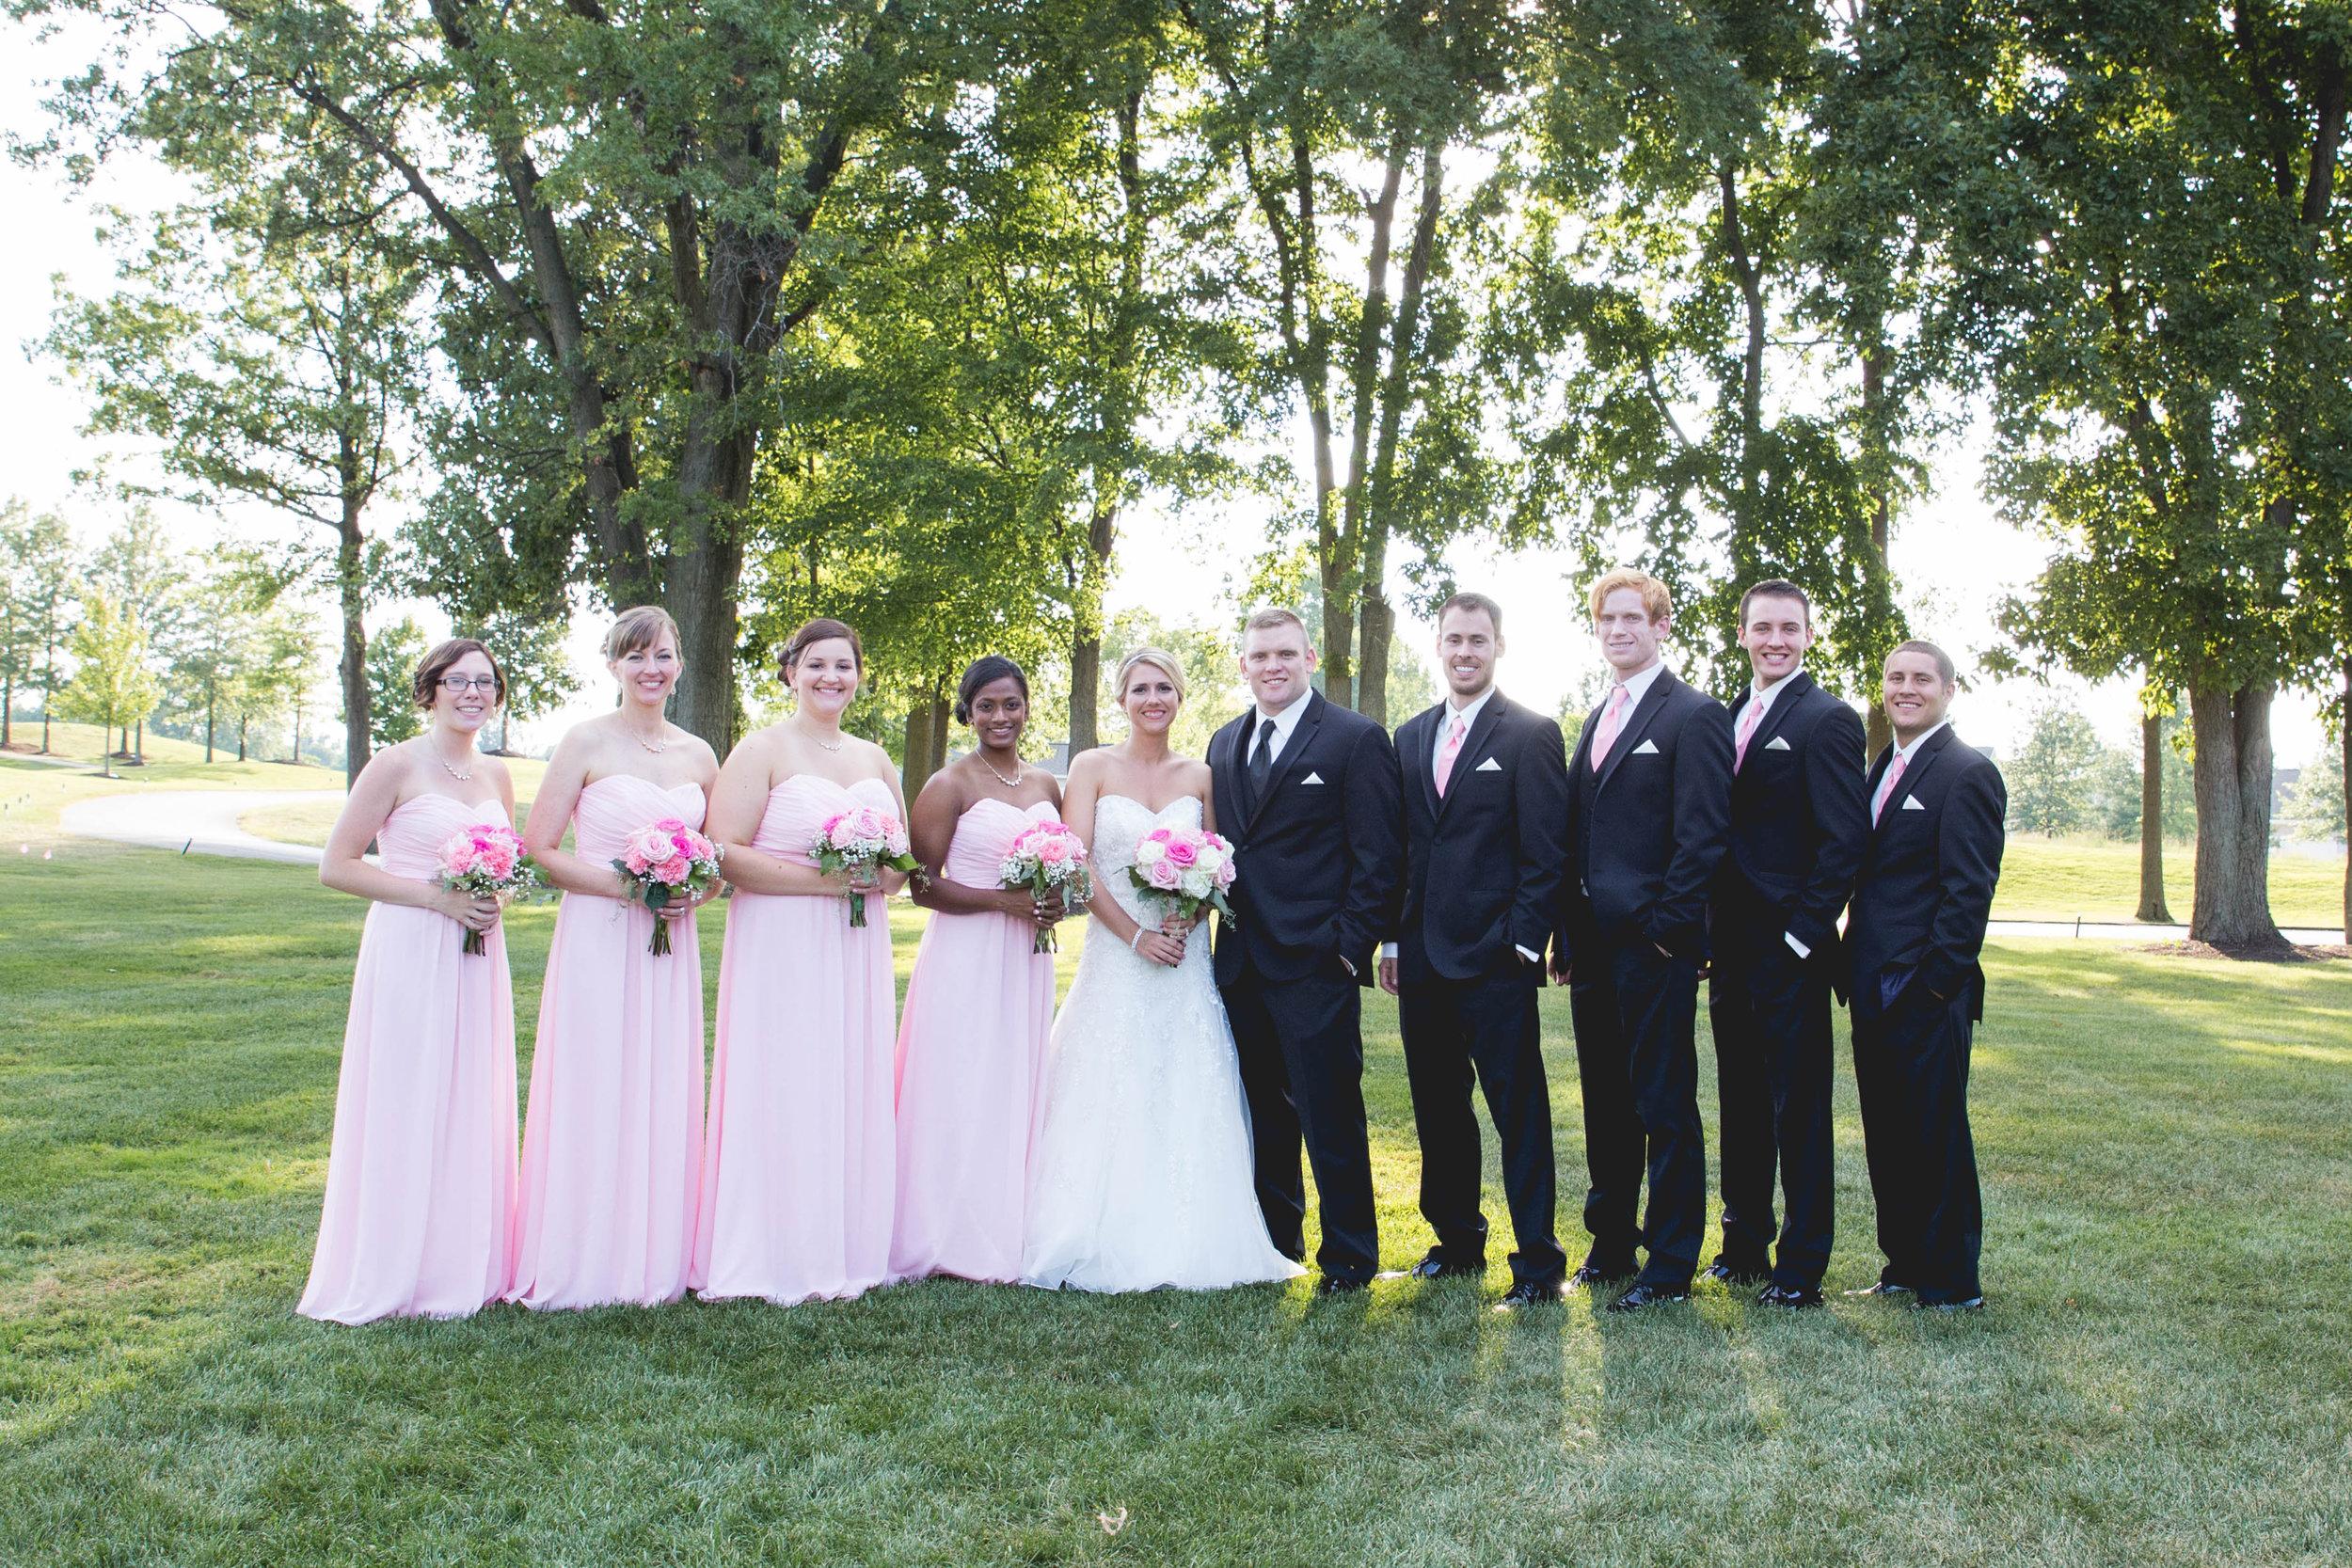 Donelson Wedding-Donelson-0364-2.jpg